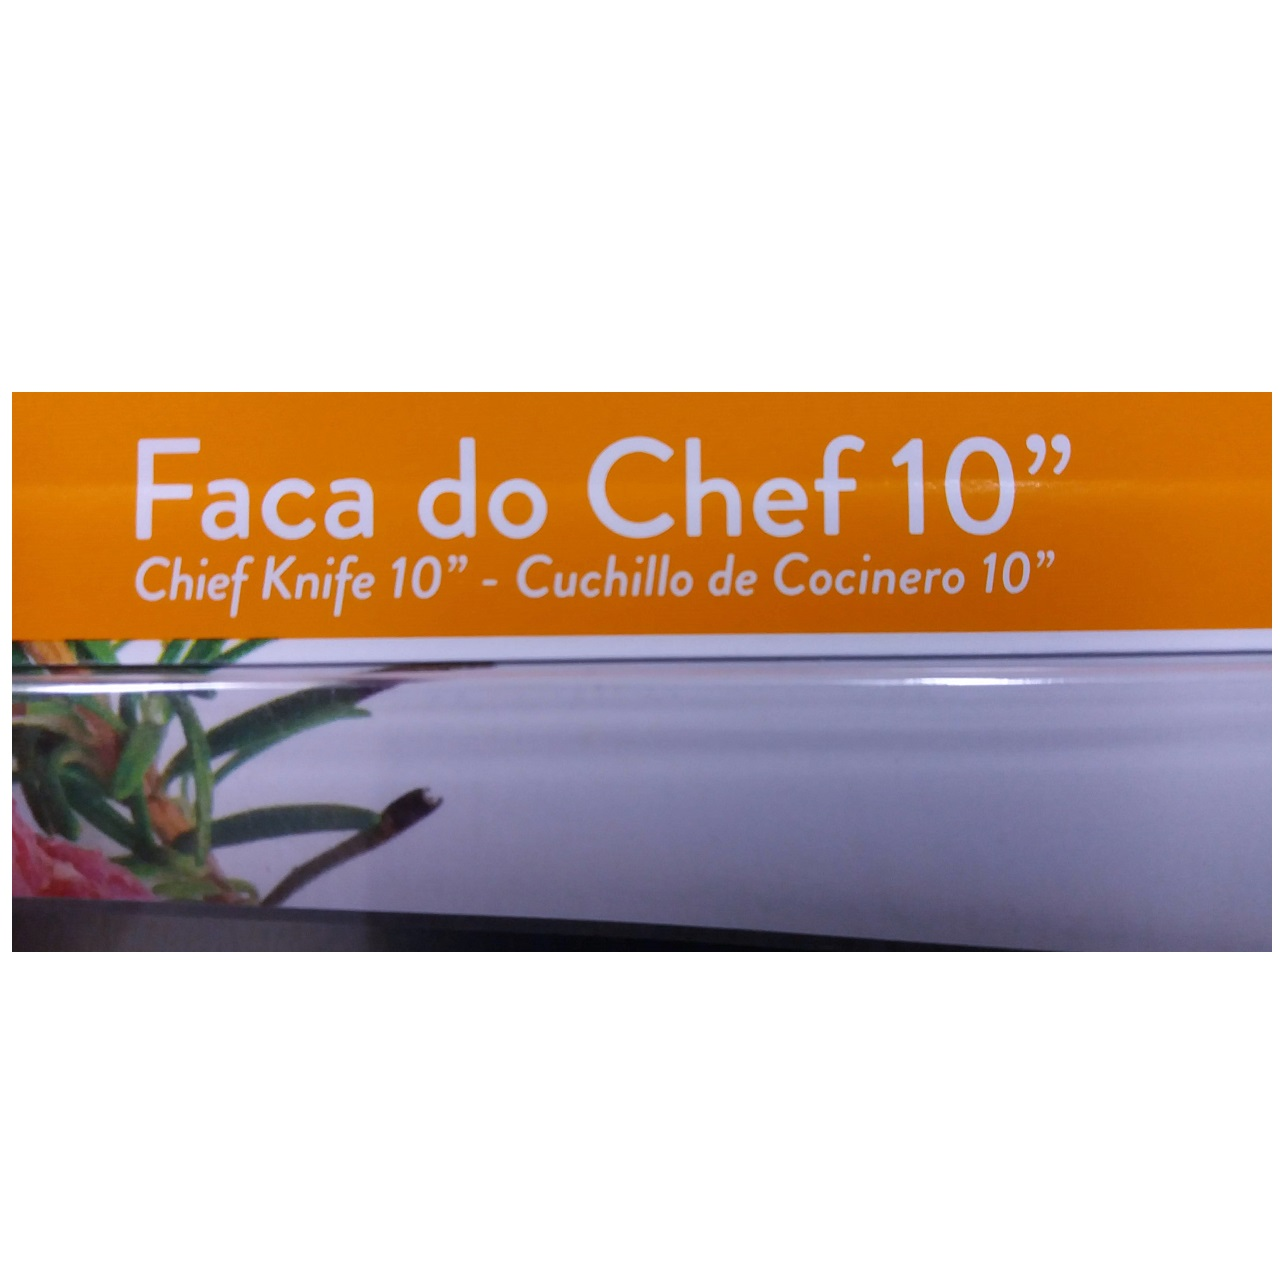 Faca 10 Official Knife Gastronomie MasterChef